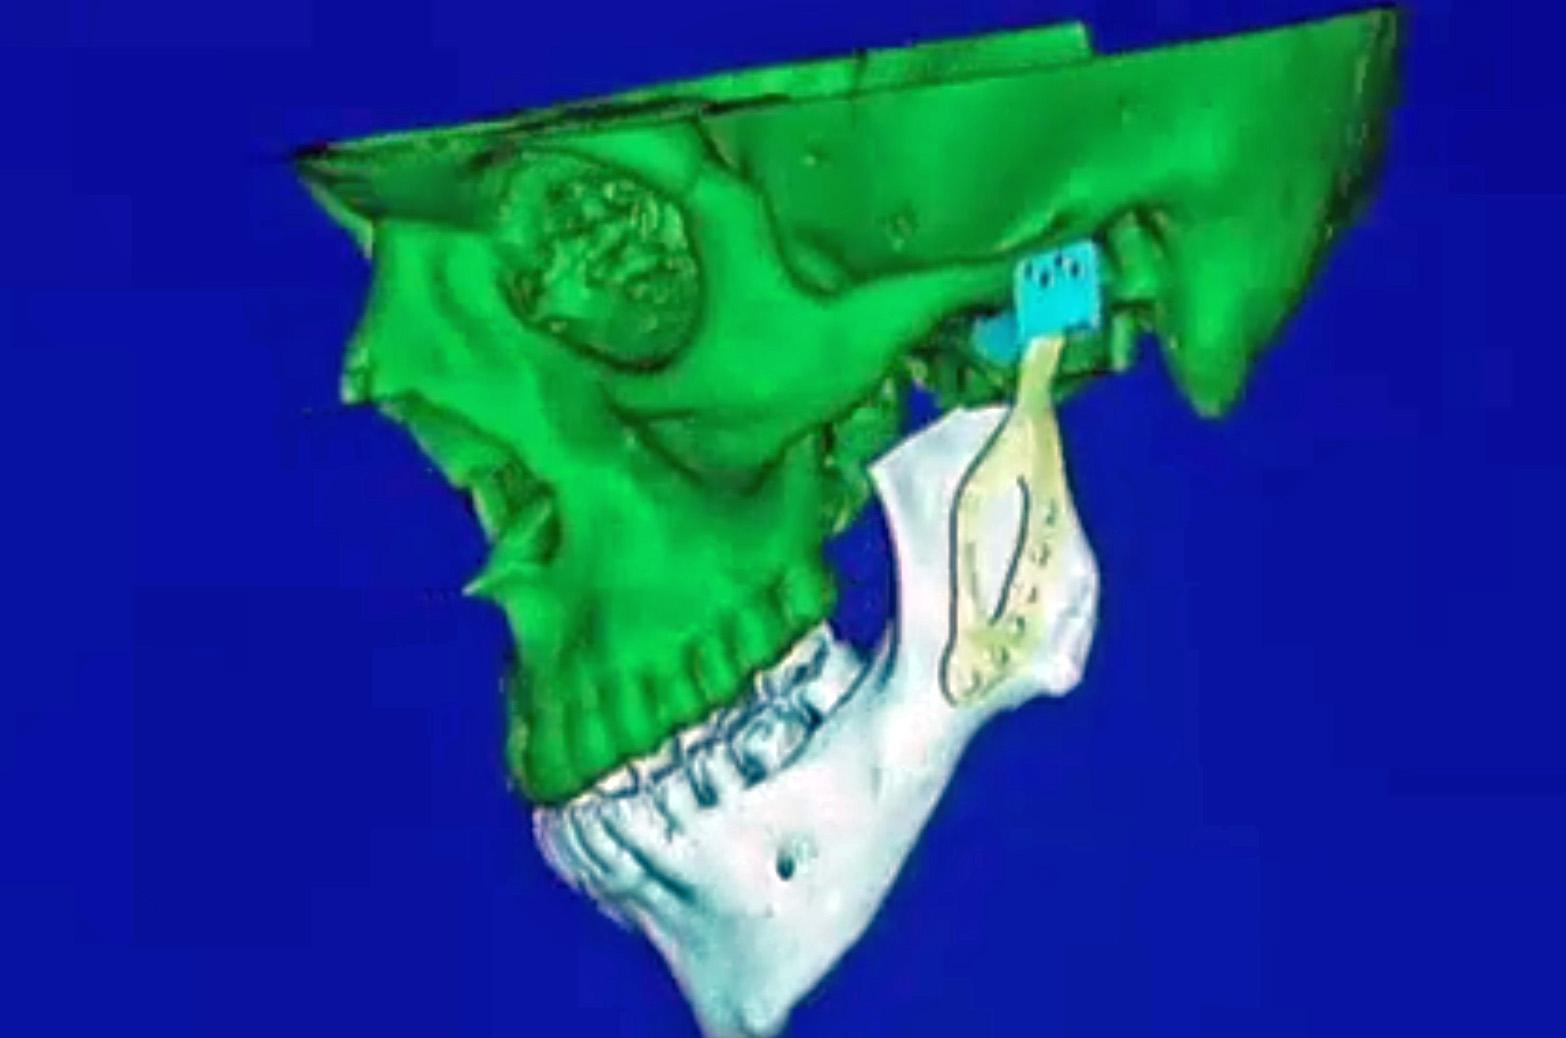 3D printed titanium prosthetic jaw joint bone